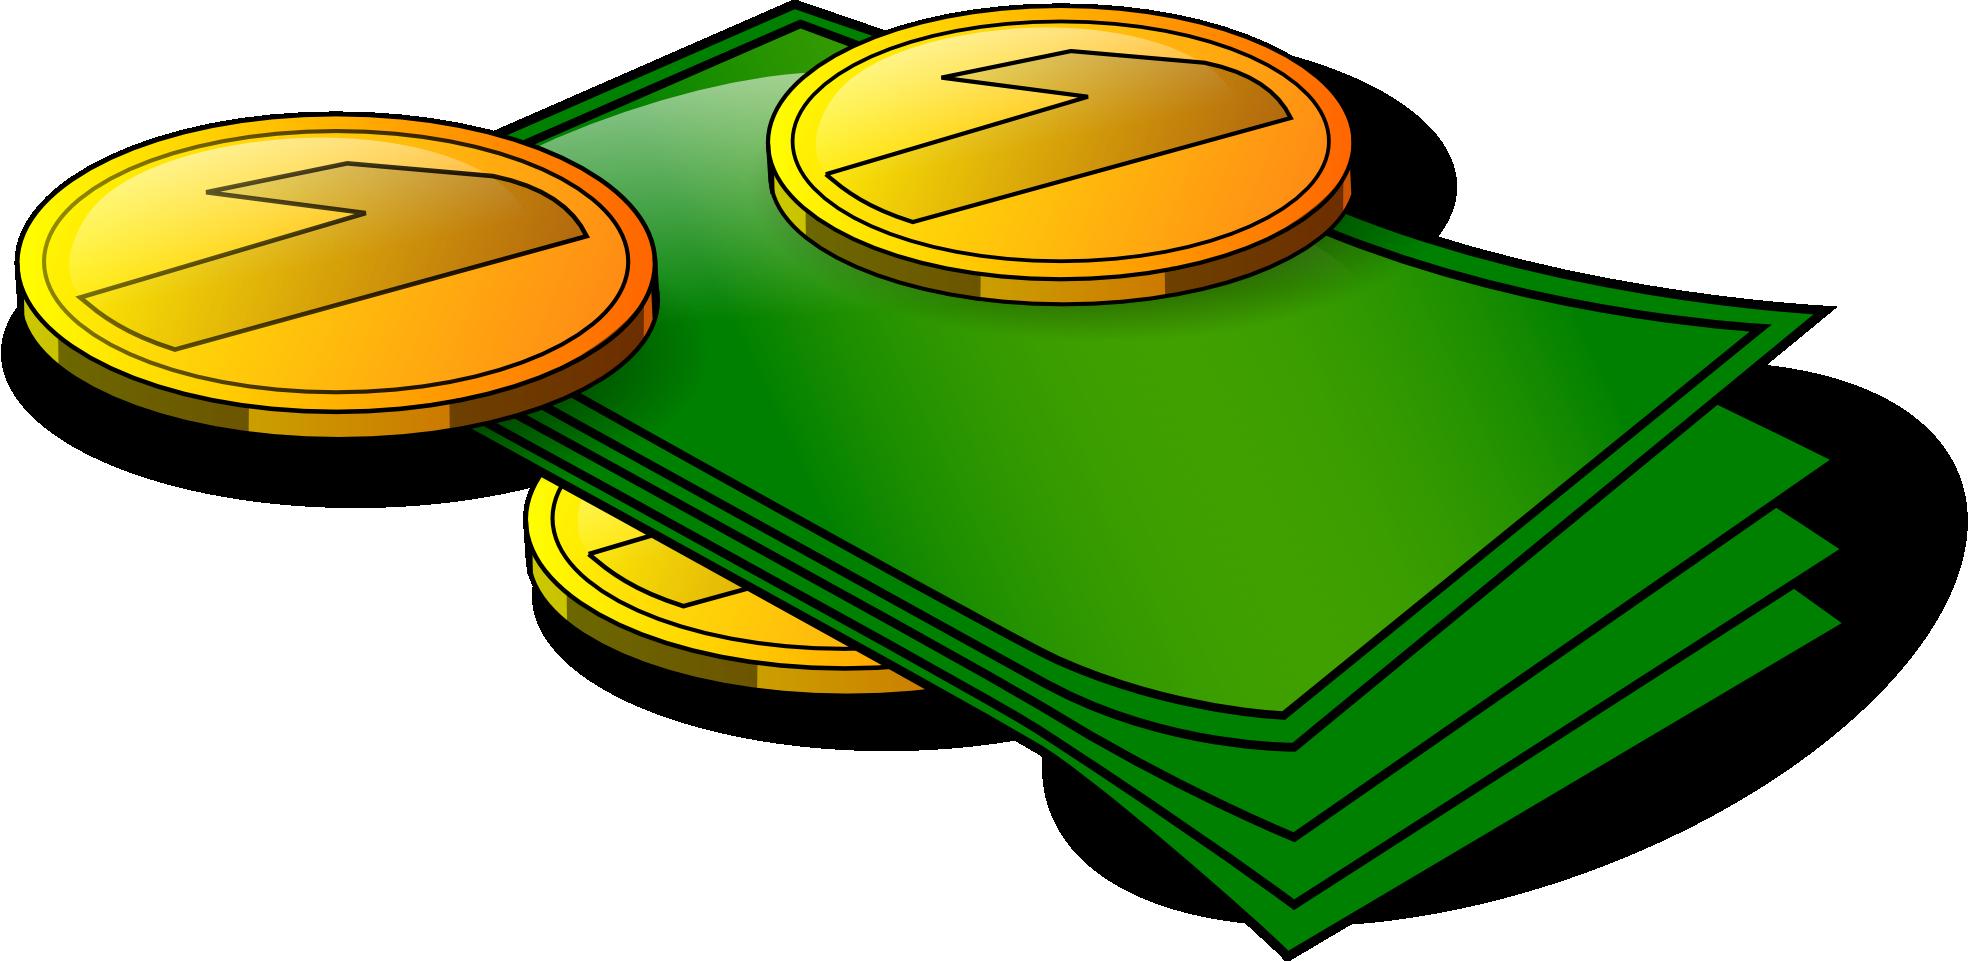 1969x961 Pot Of Money Clipart